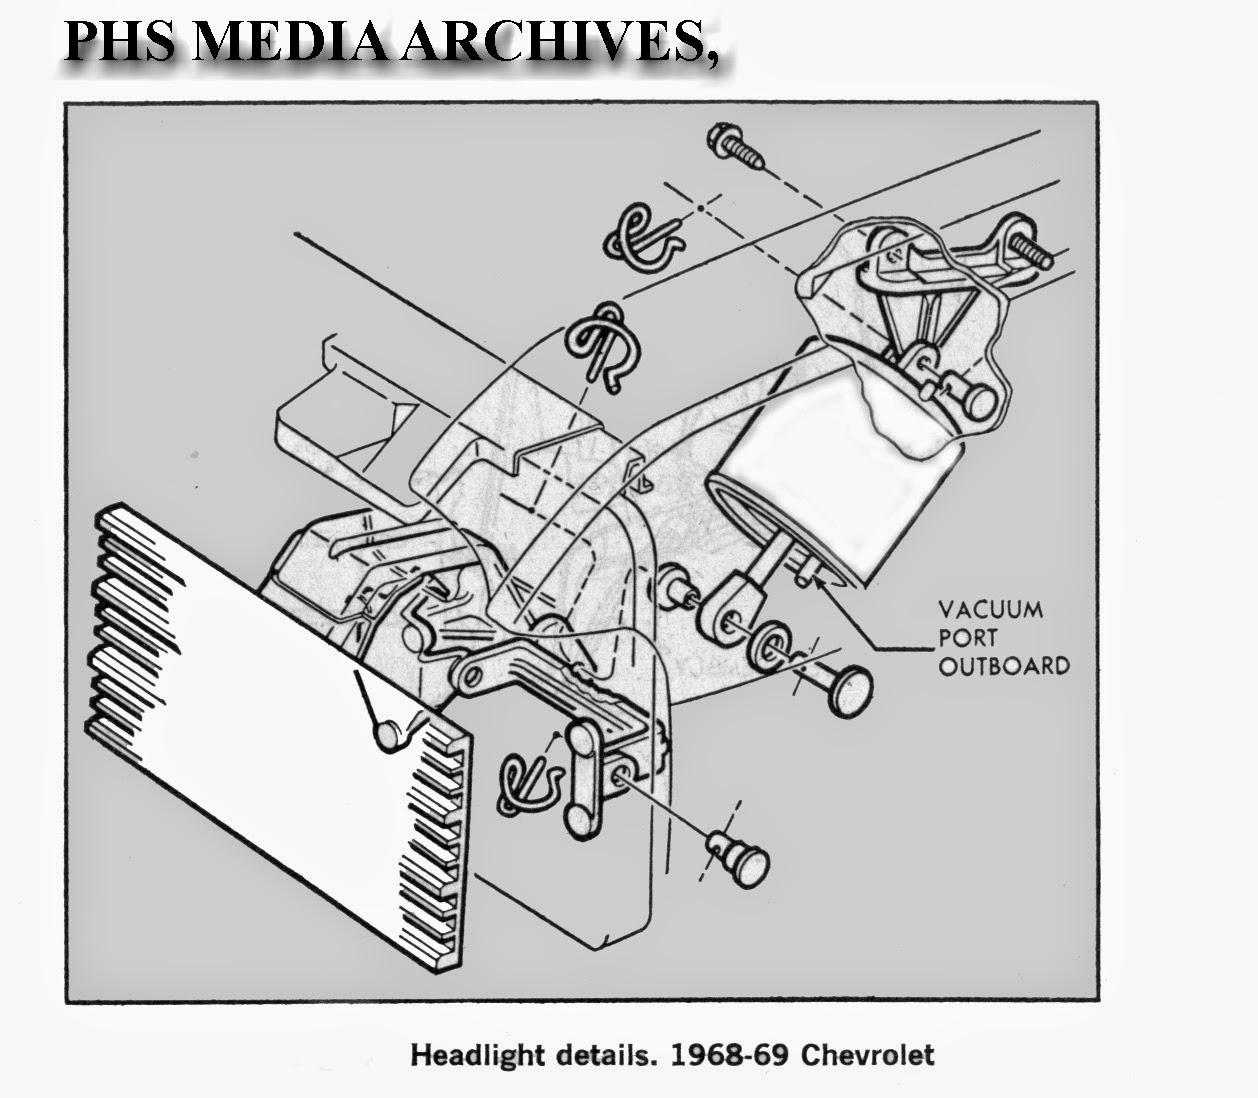 68 Corvette Headlight Vacuum Diagram Wiring Will Be A Thing 1969 Windshield Wiper Tech Files Chevrolet Hidden Headlamp Door System Caprice Impala Rh Phscollectorcarworld Blogspot Com 2004 1971